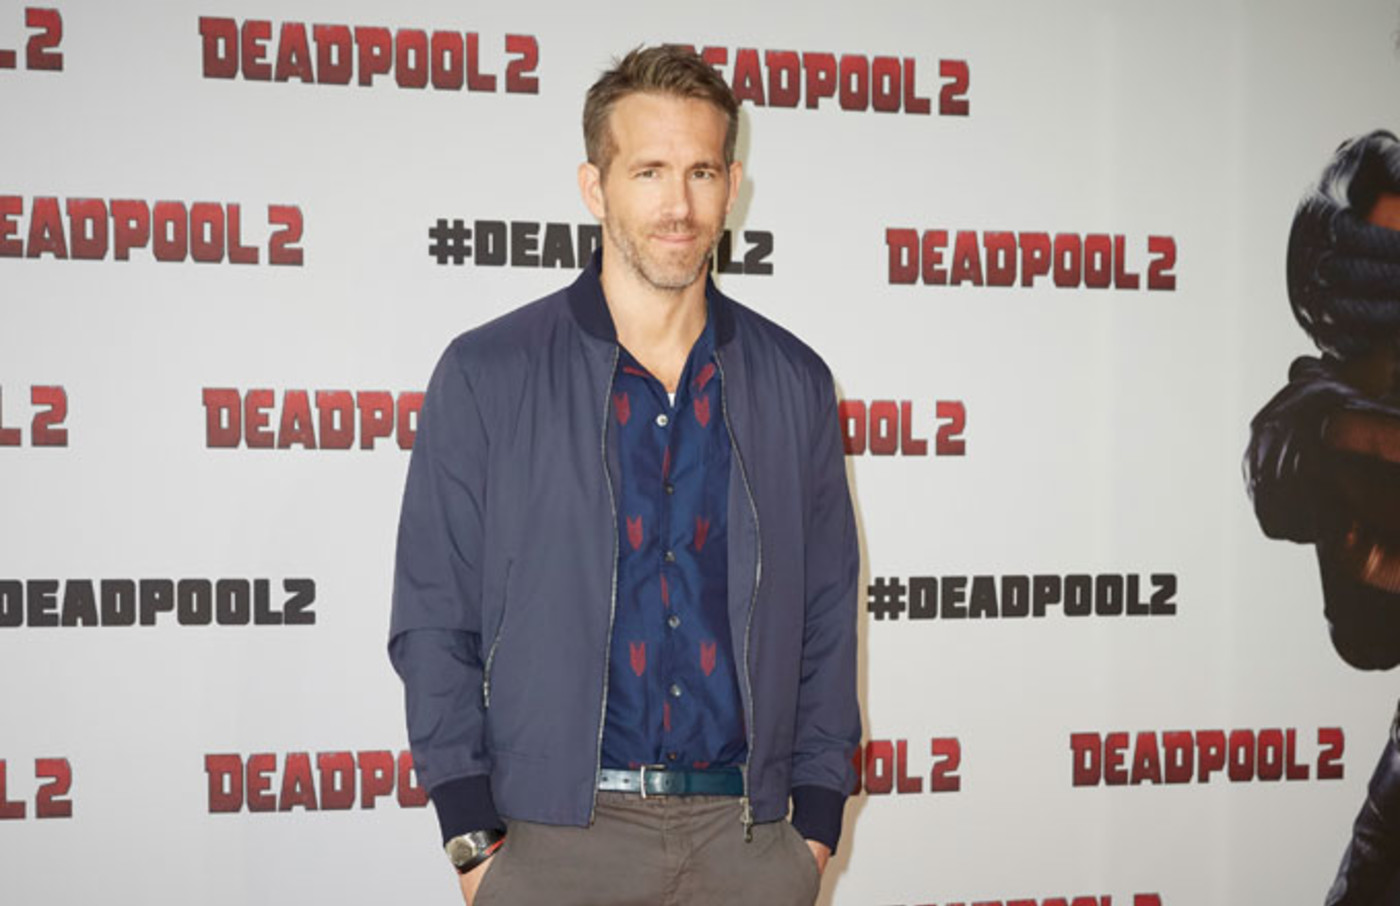 Ryan Reynolds attends a 'Deadpool 2' press conference